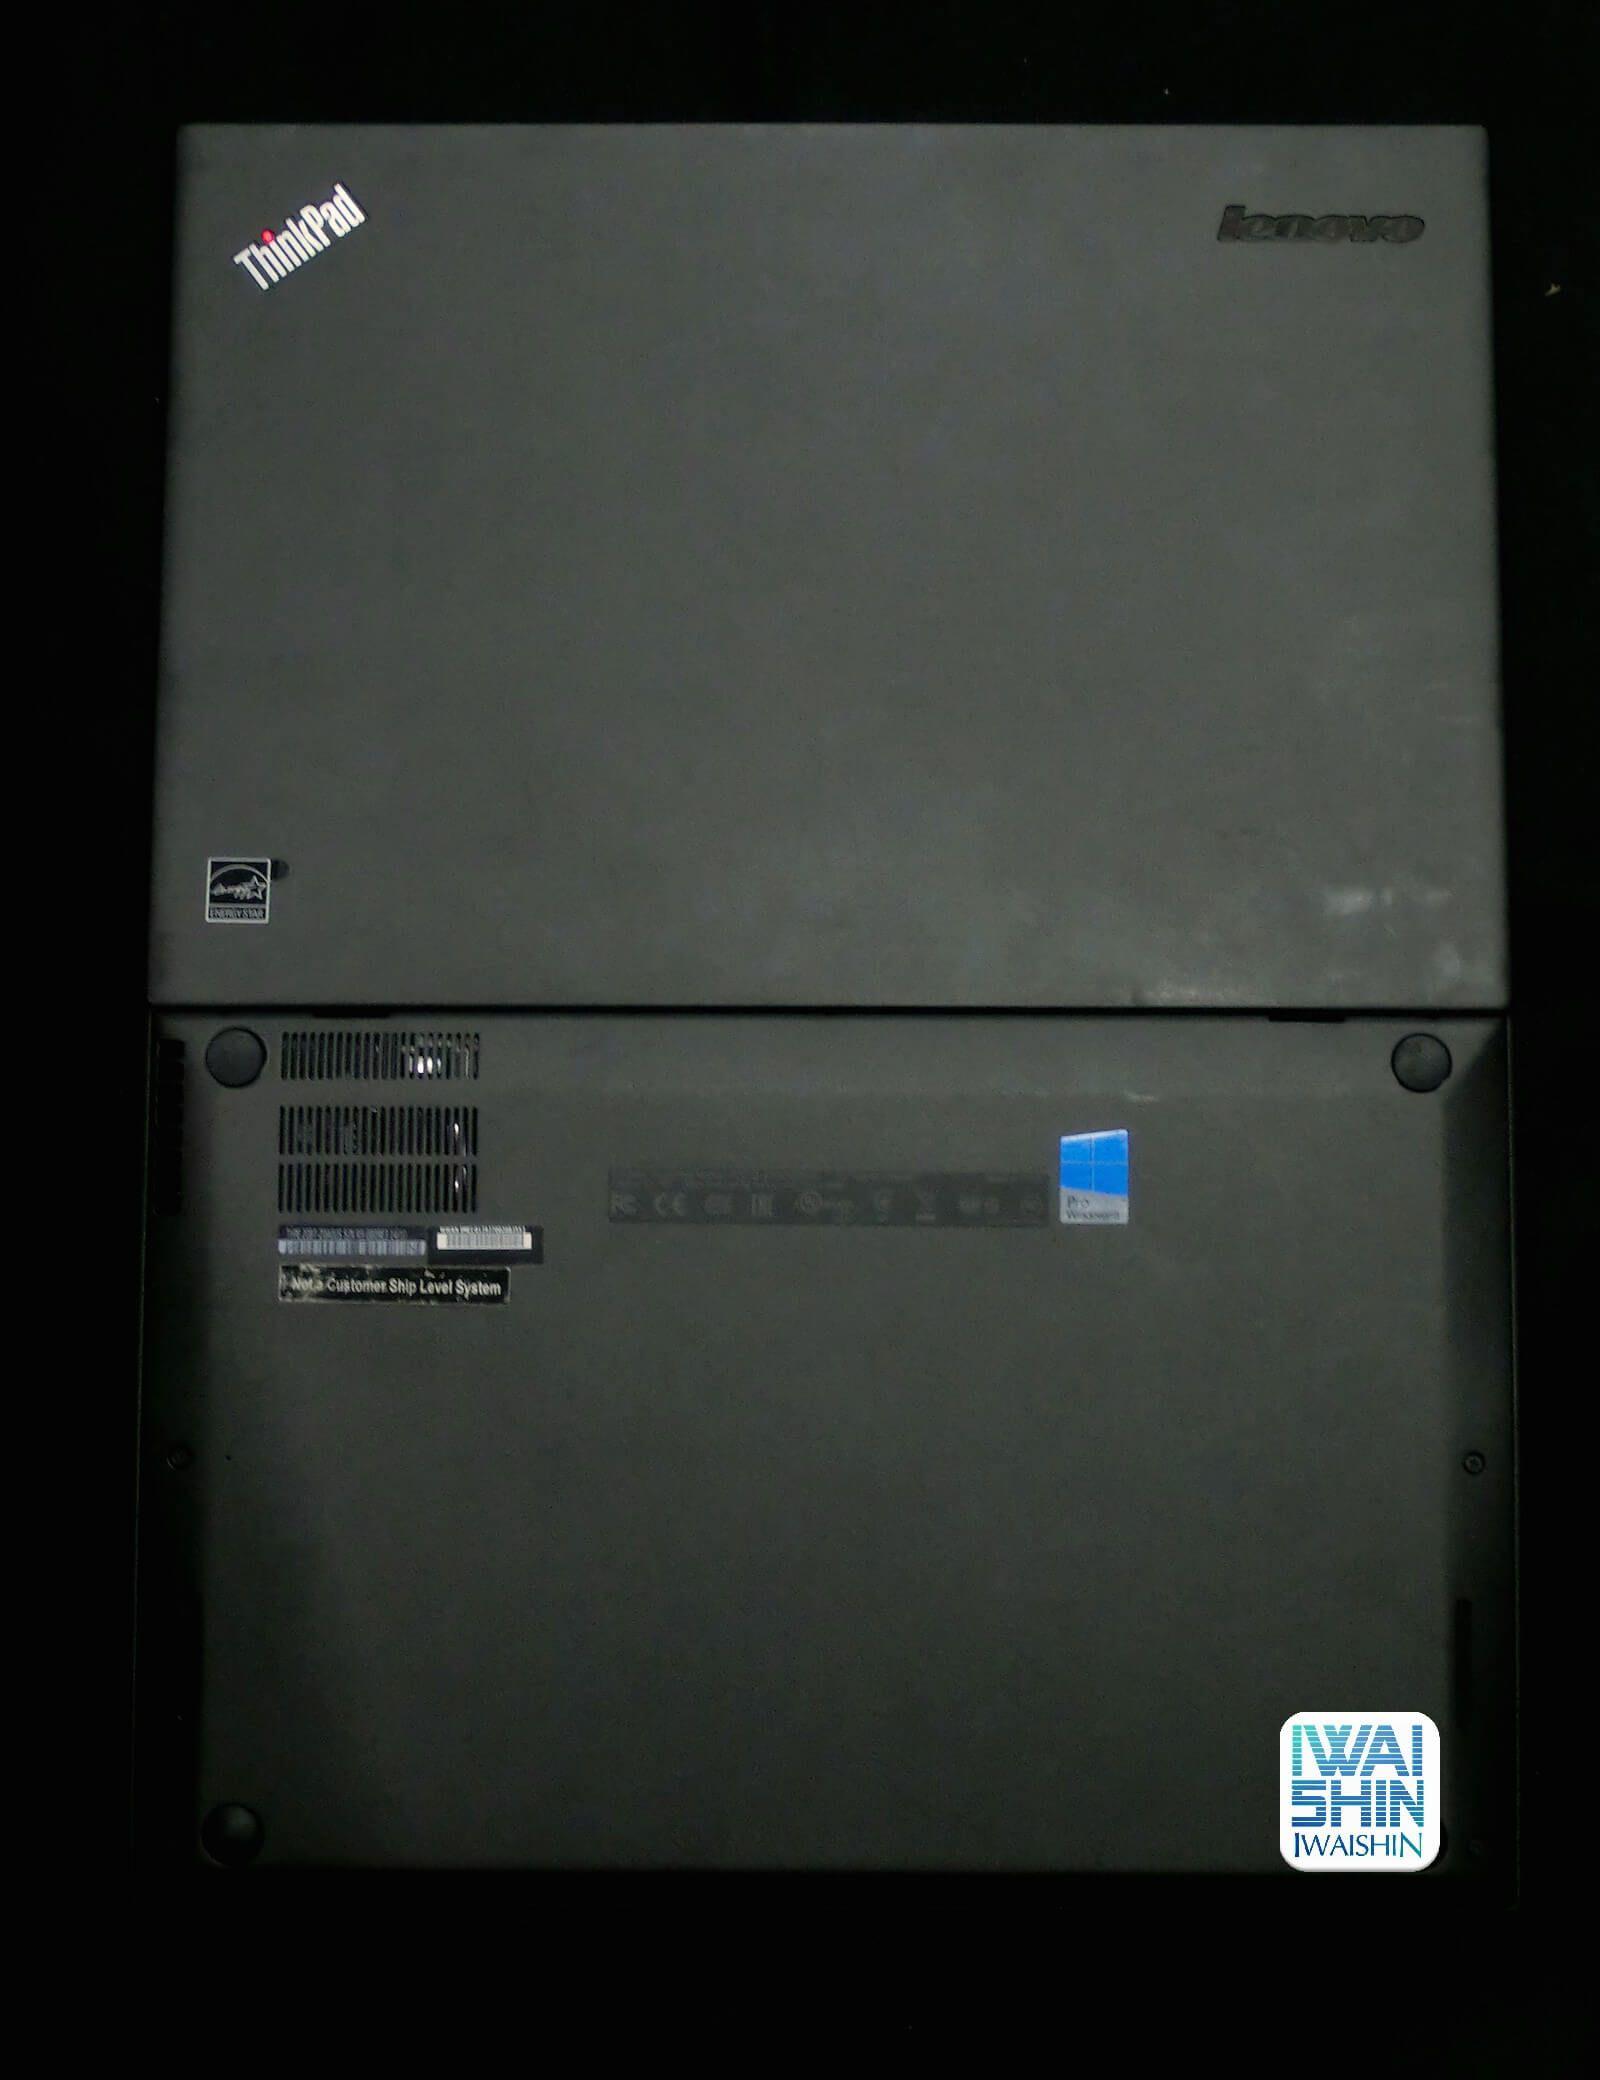 Lenovo ThinkPad x1 Carbon963